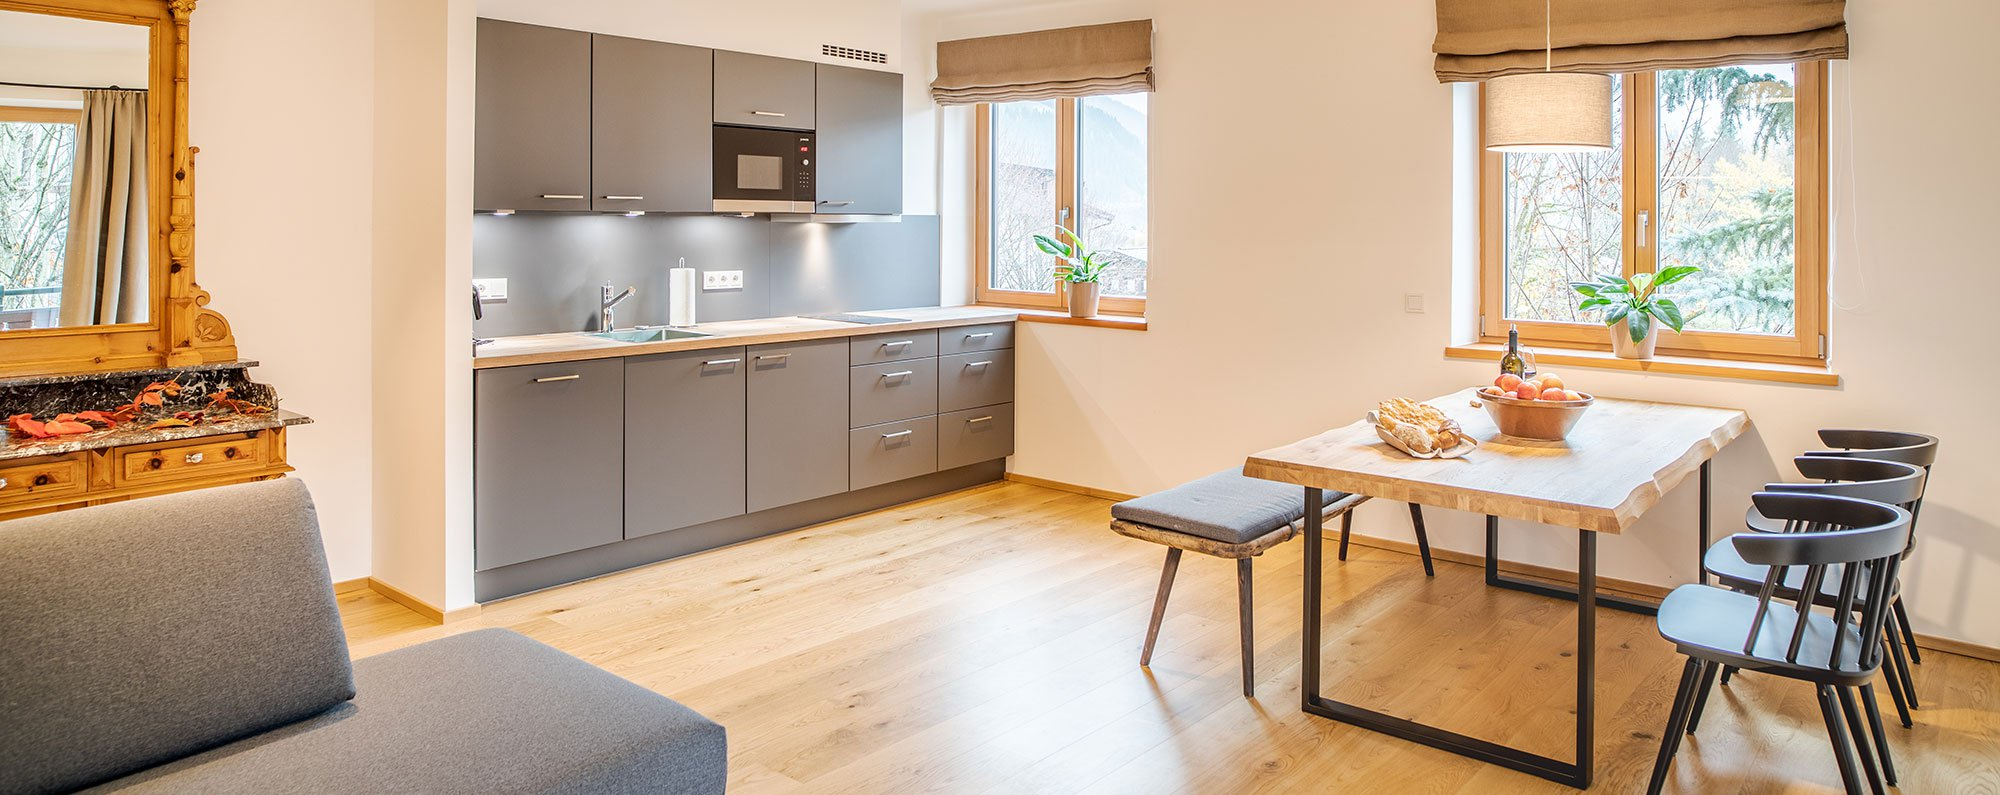 kraemerhaus-apartments-hero